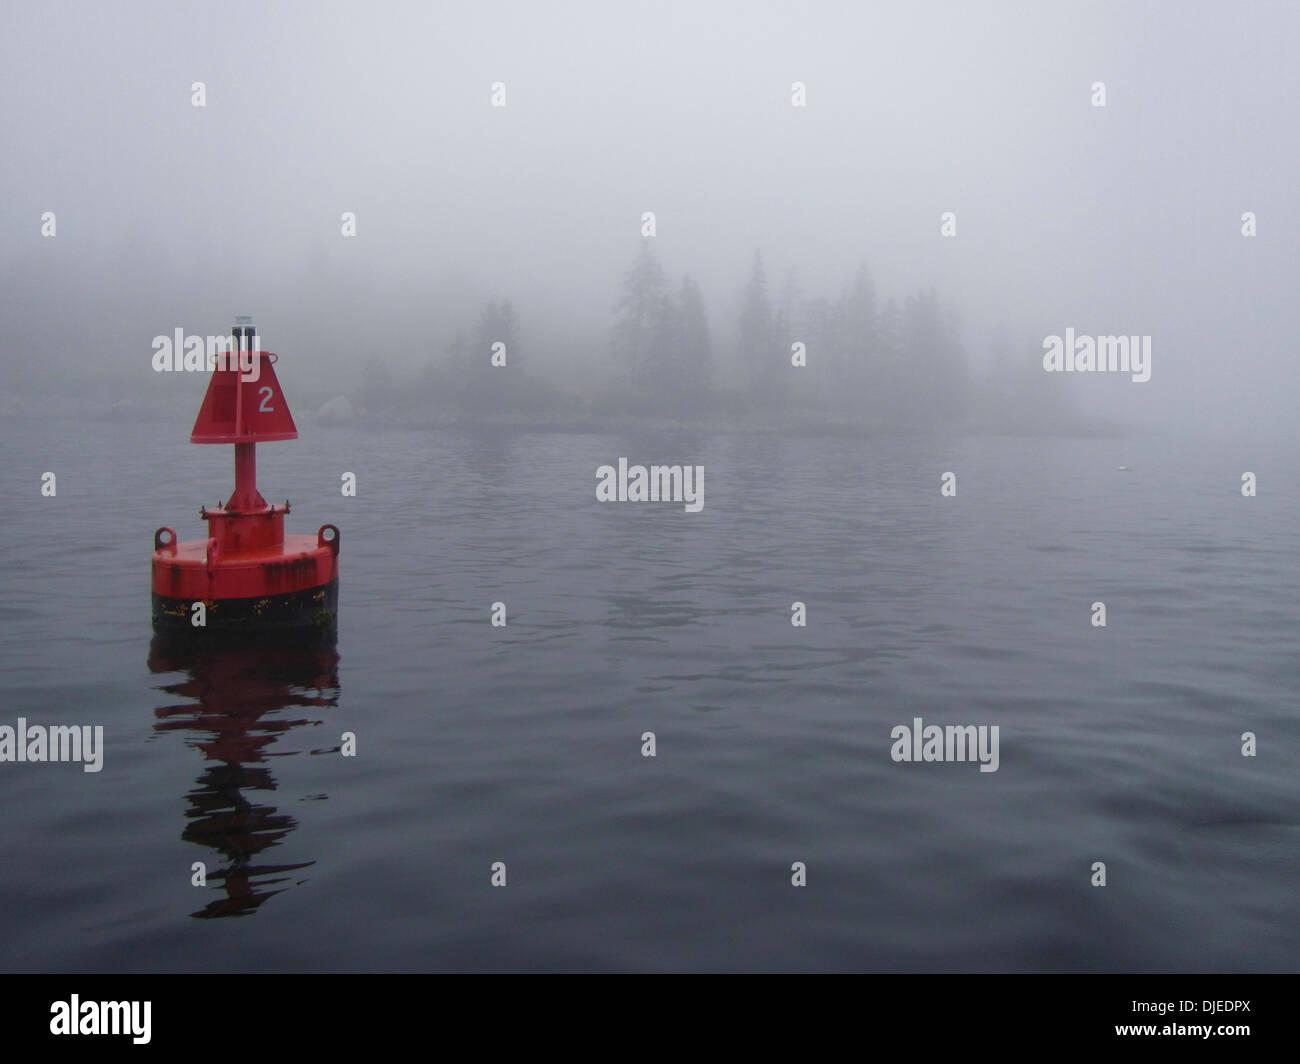 A fog bound island and navigational buoy along the coast of Maine. - Stock Image